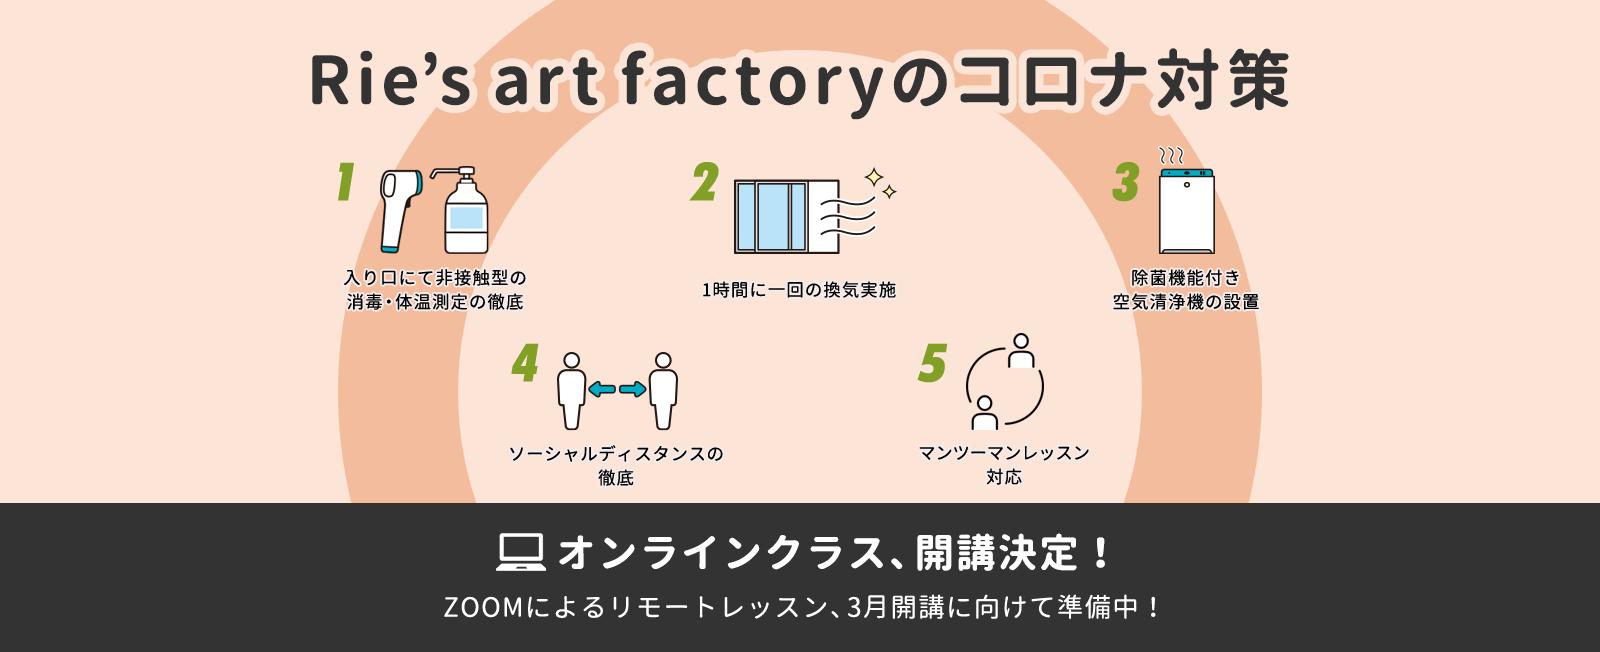 Rie's art factoryのコロナ対策